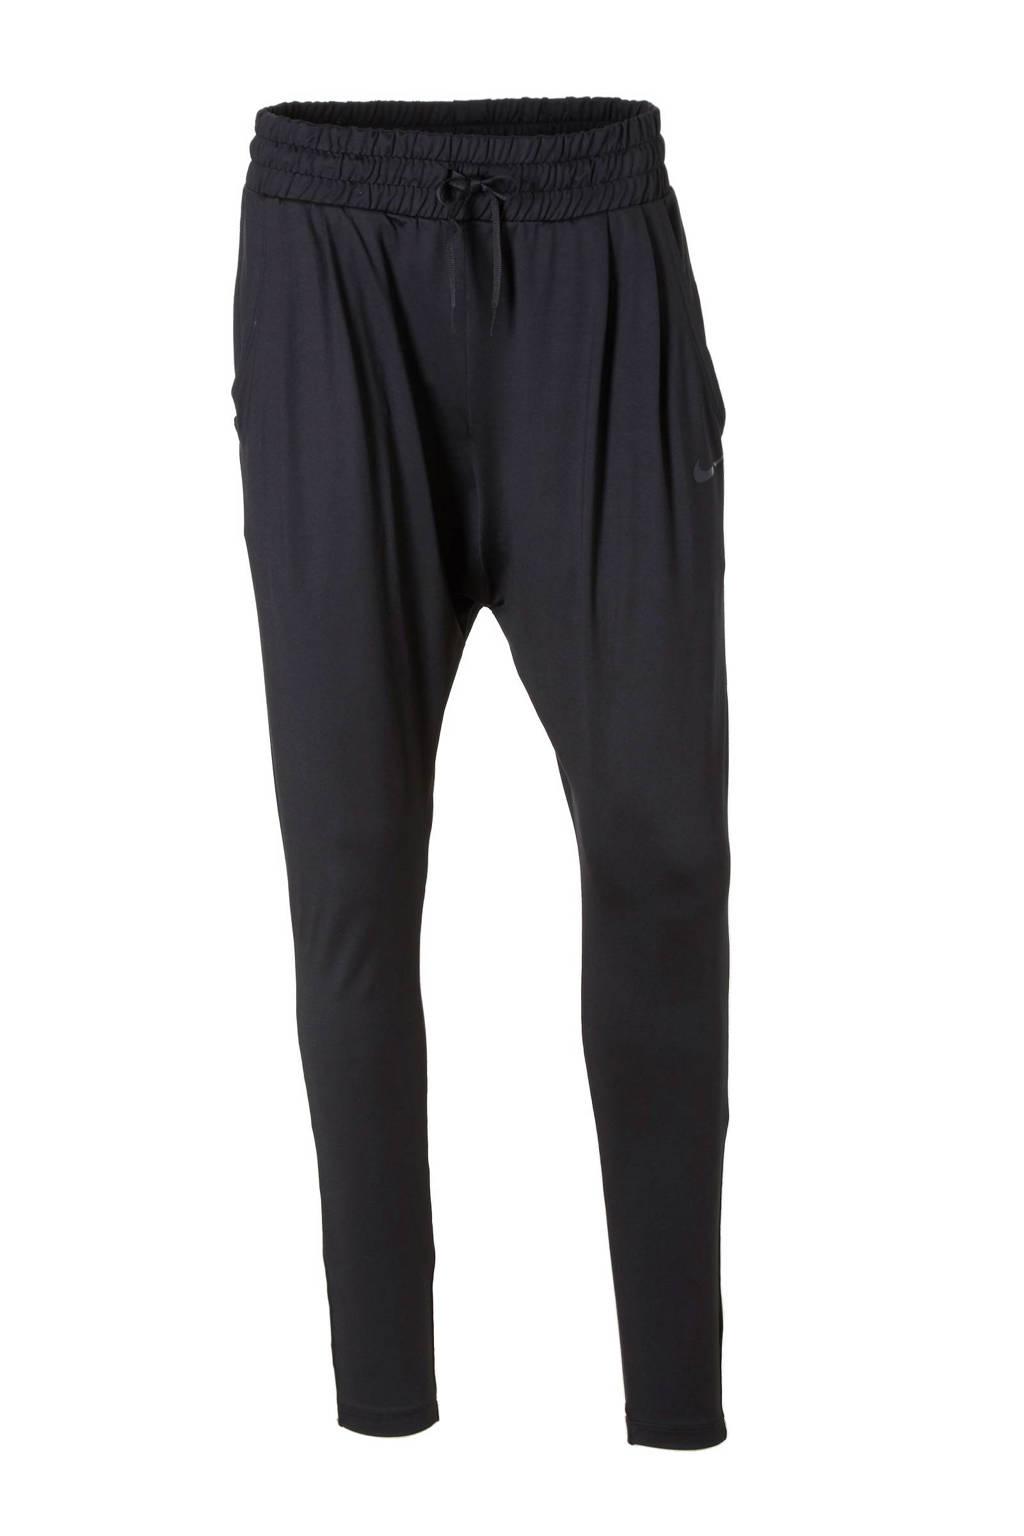 Nike sportbroek, Zwart